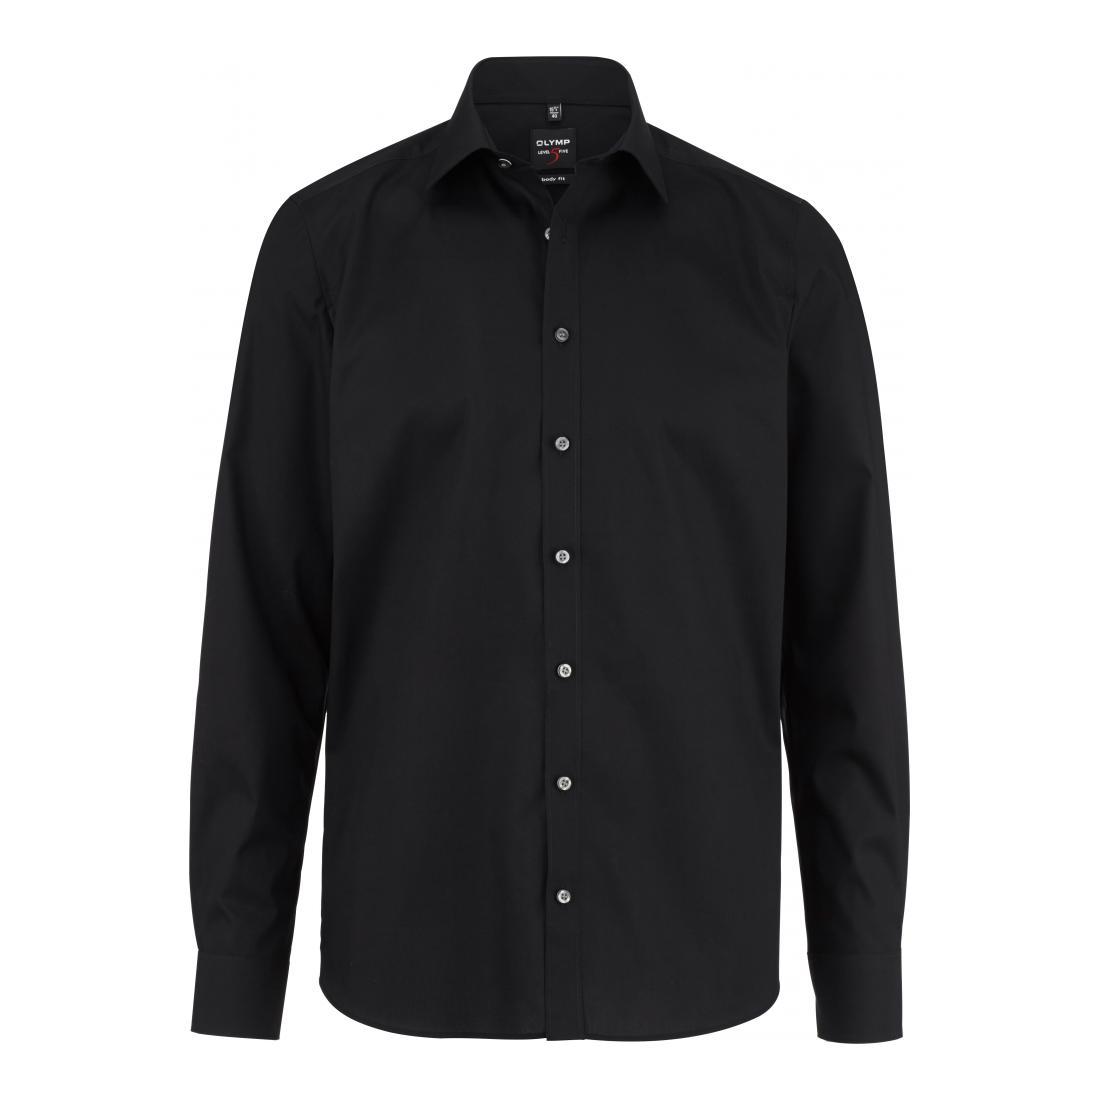 Olymp Business Hemden Herren 6090/64 Hemden